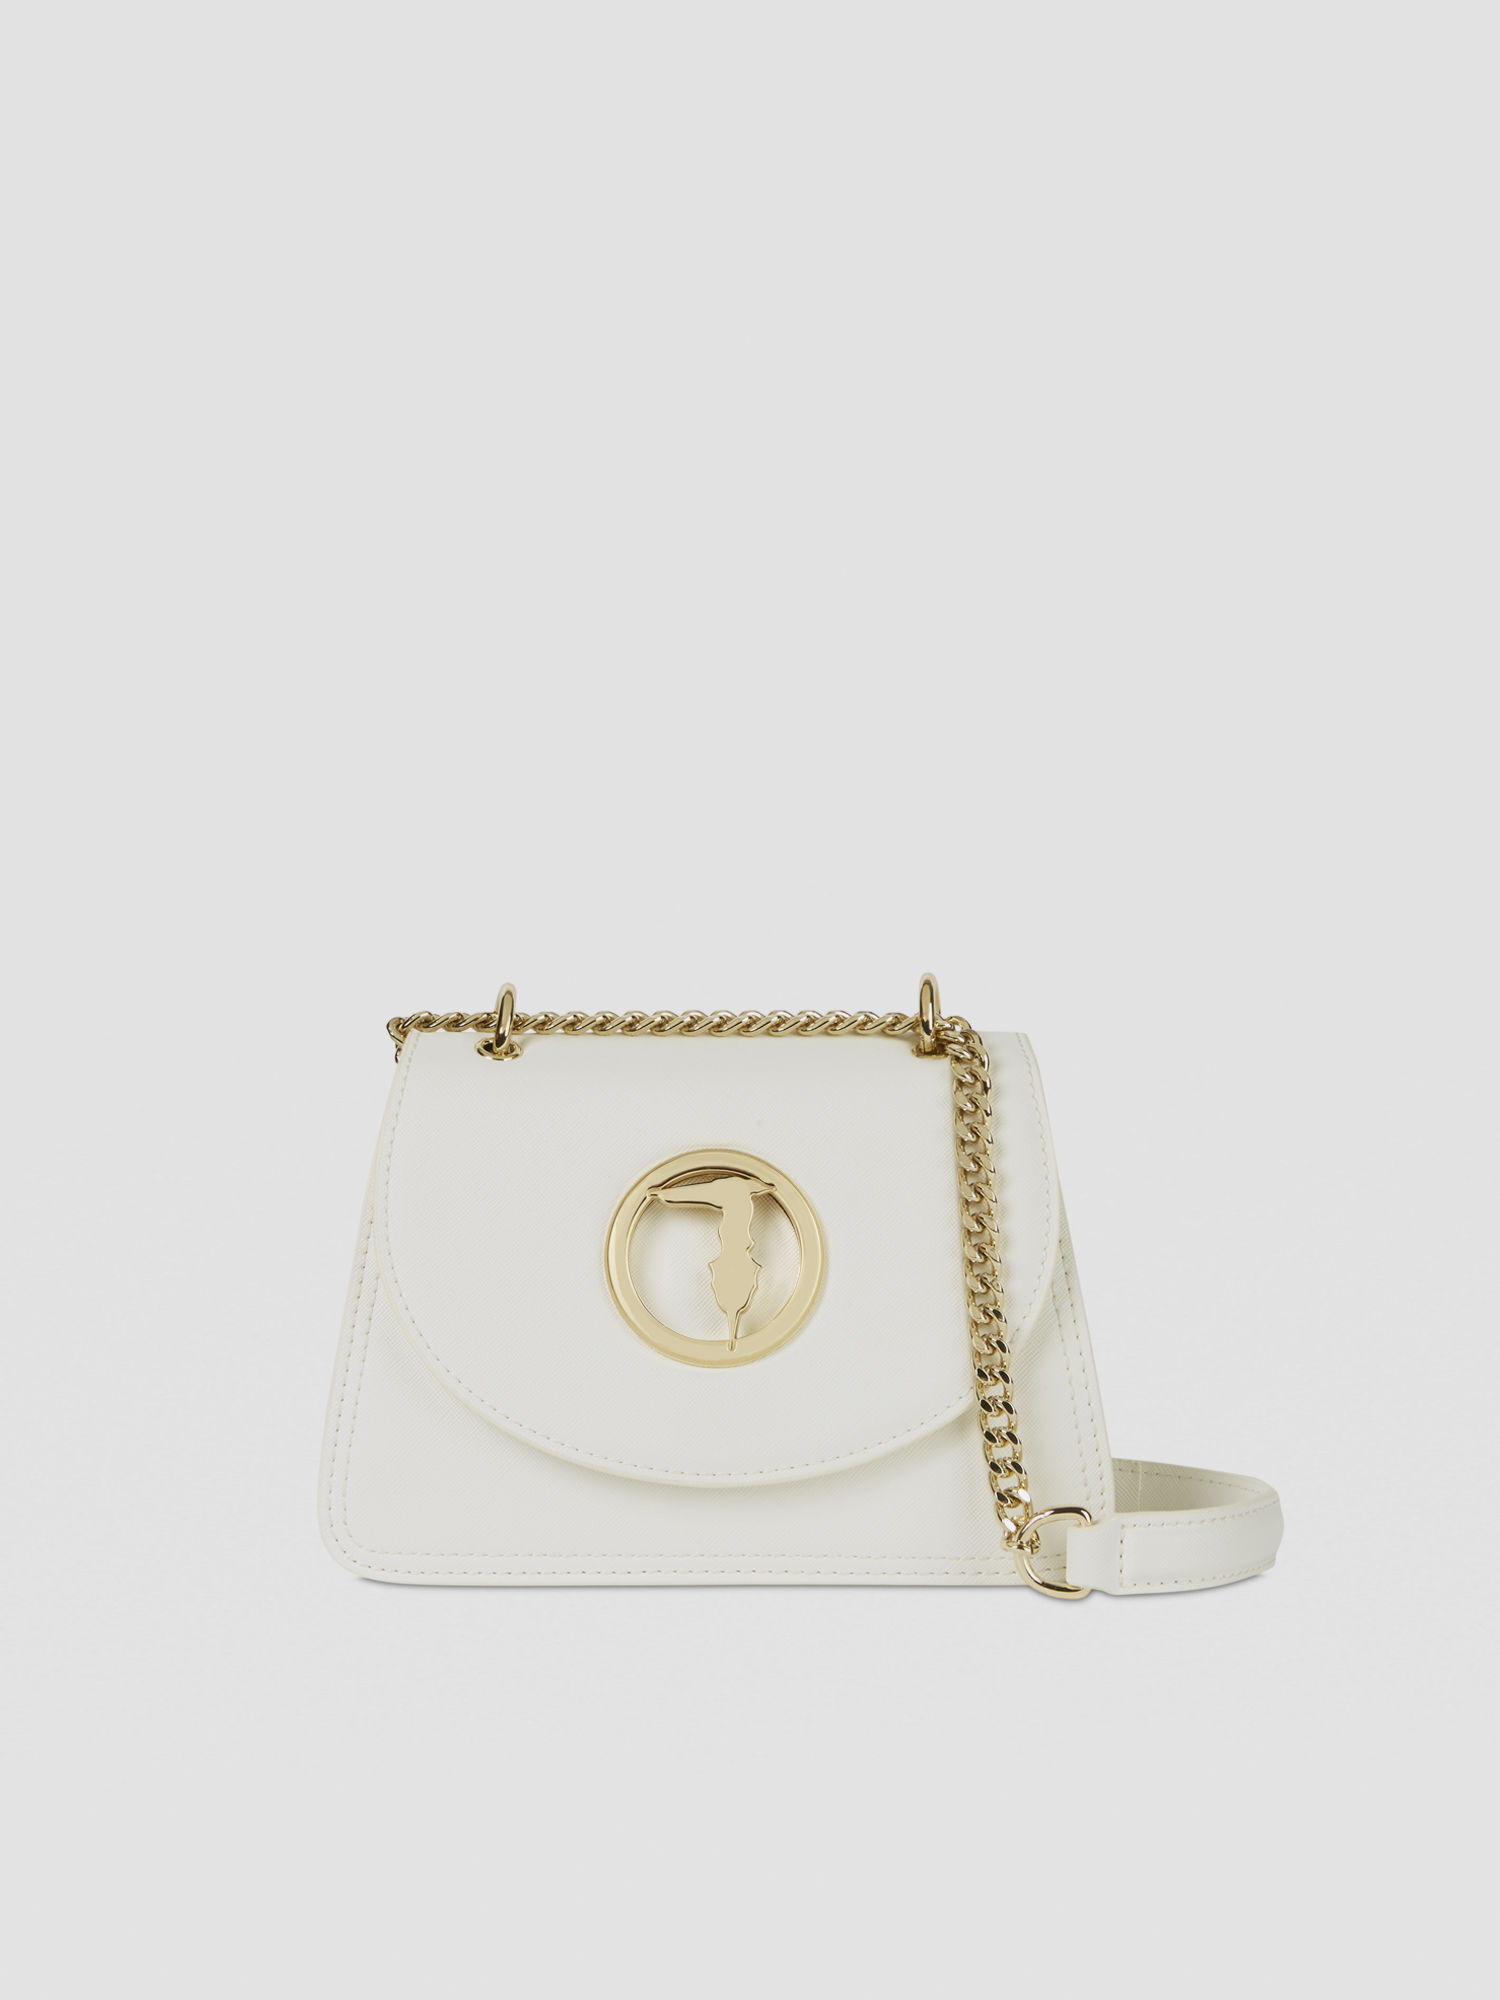 Trussardi White Leather Handbag